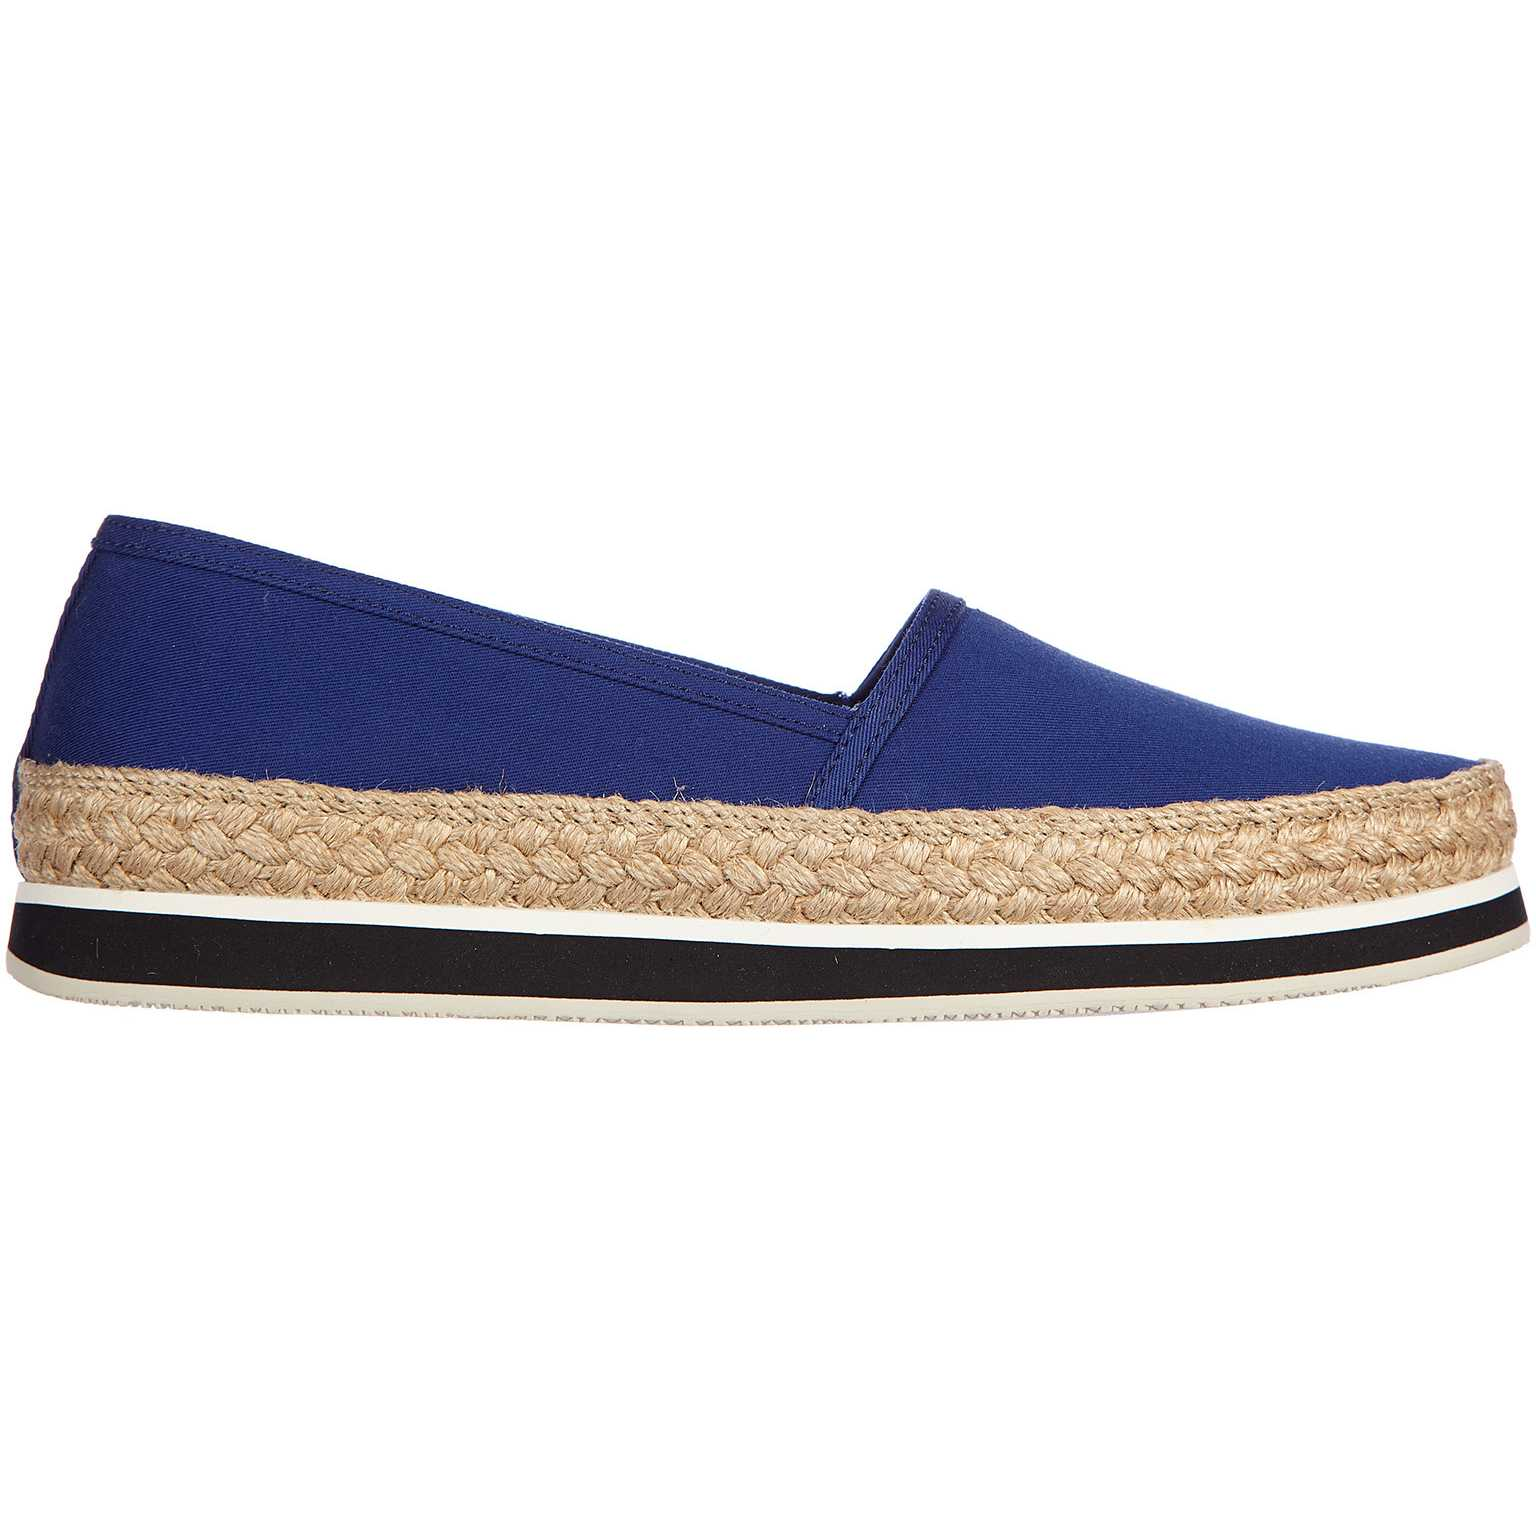 Prada Sneakers Gabardine Blue pentru dama